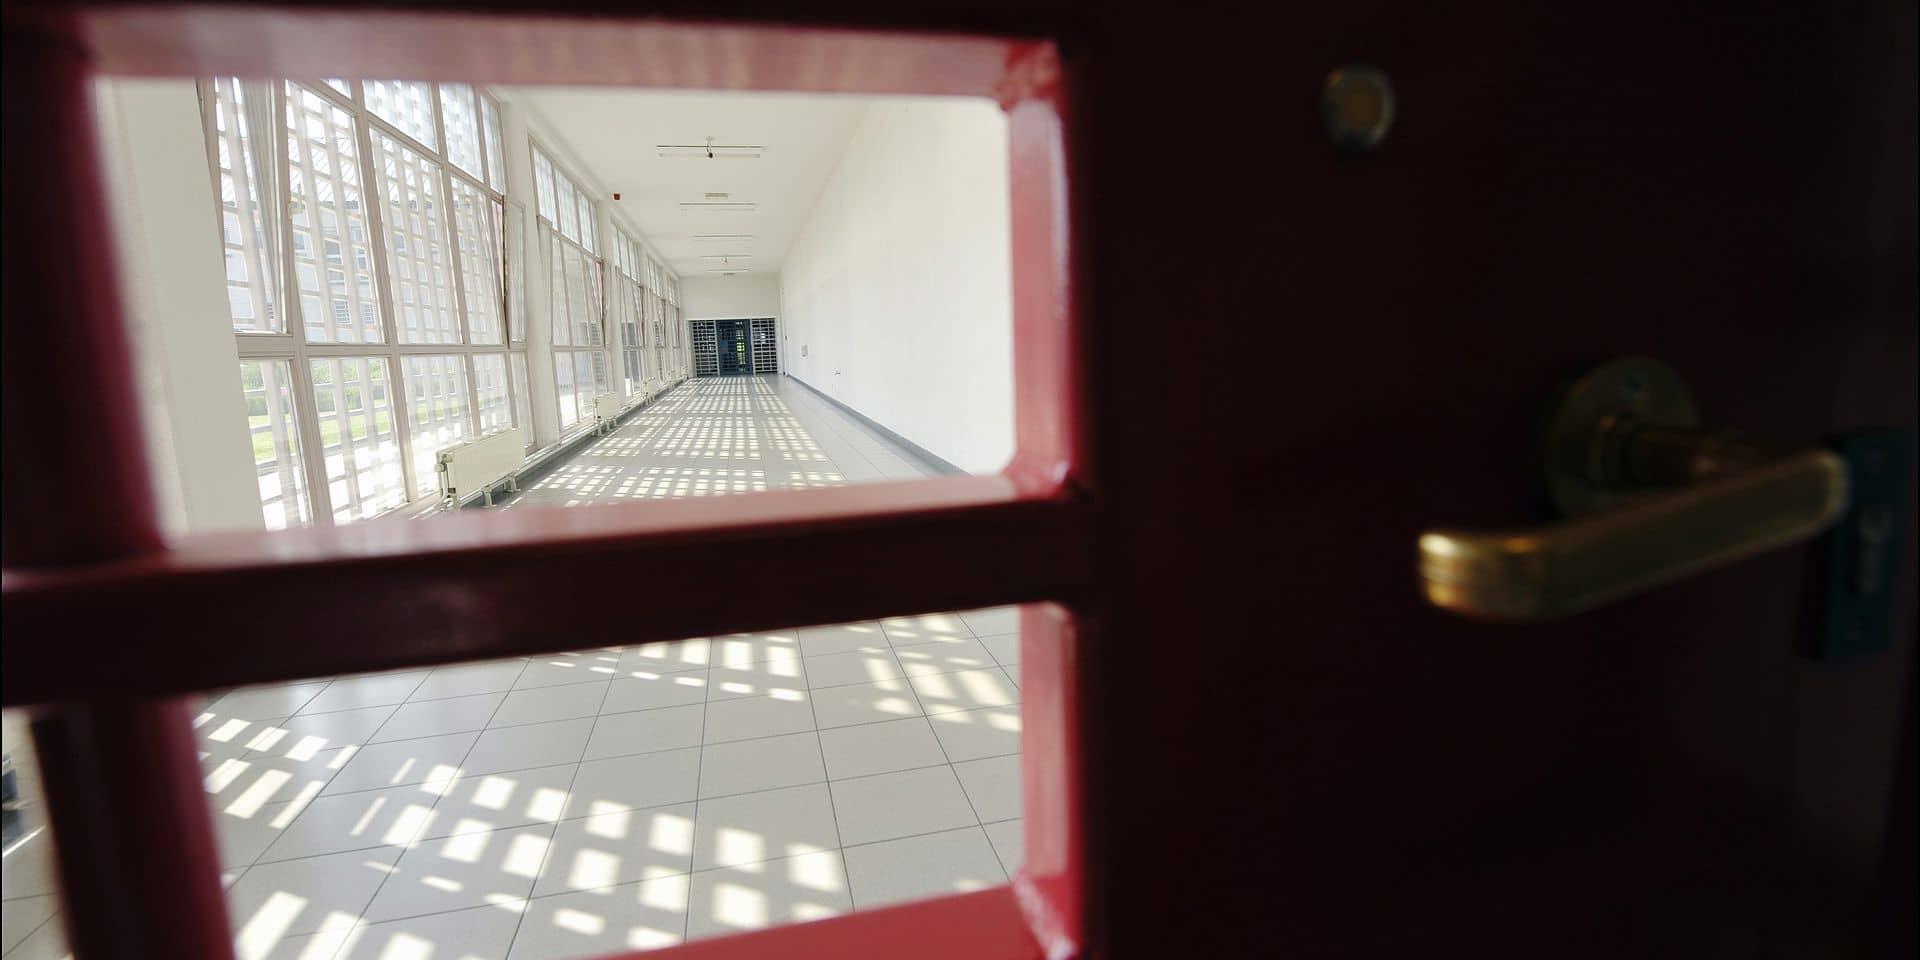 Prison of Ittre